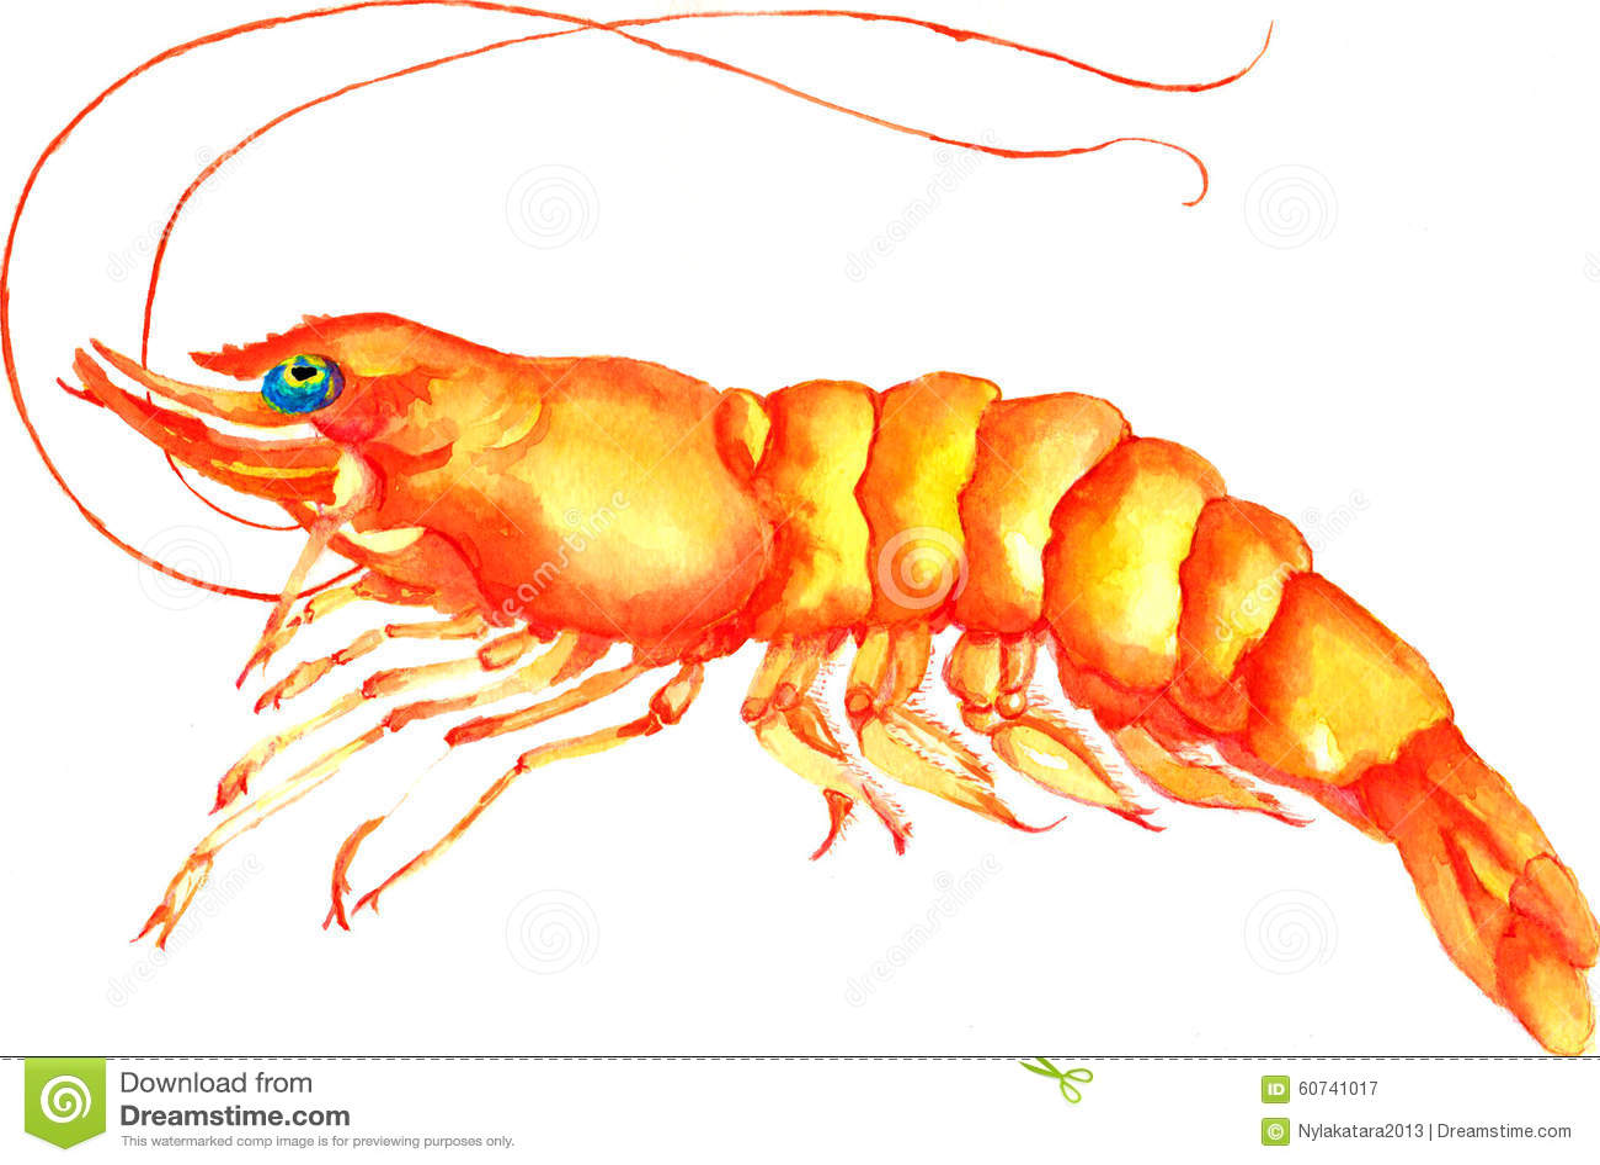 Shrimp Stock Illustration - Image: 60741017